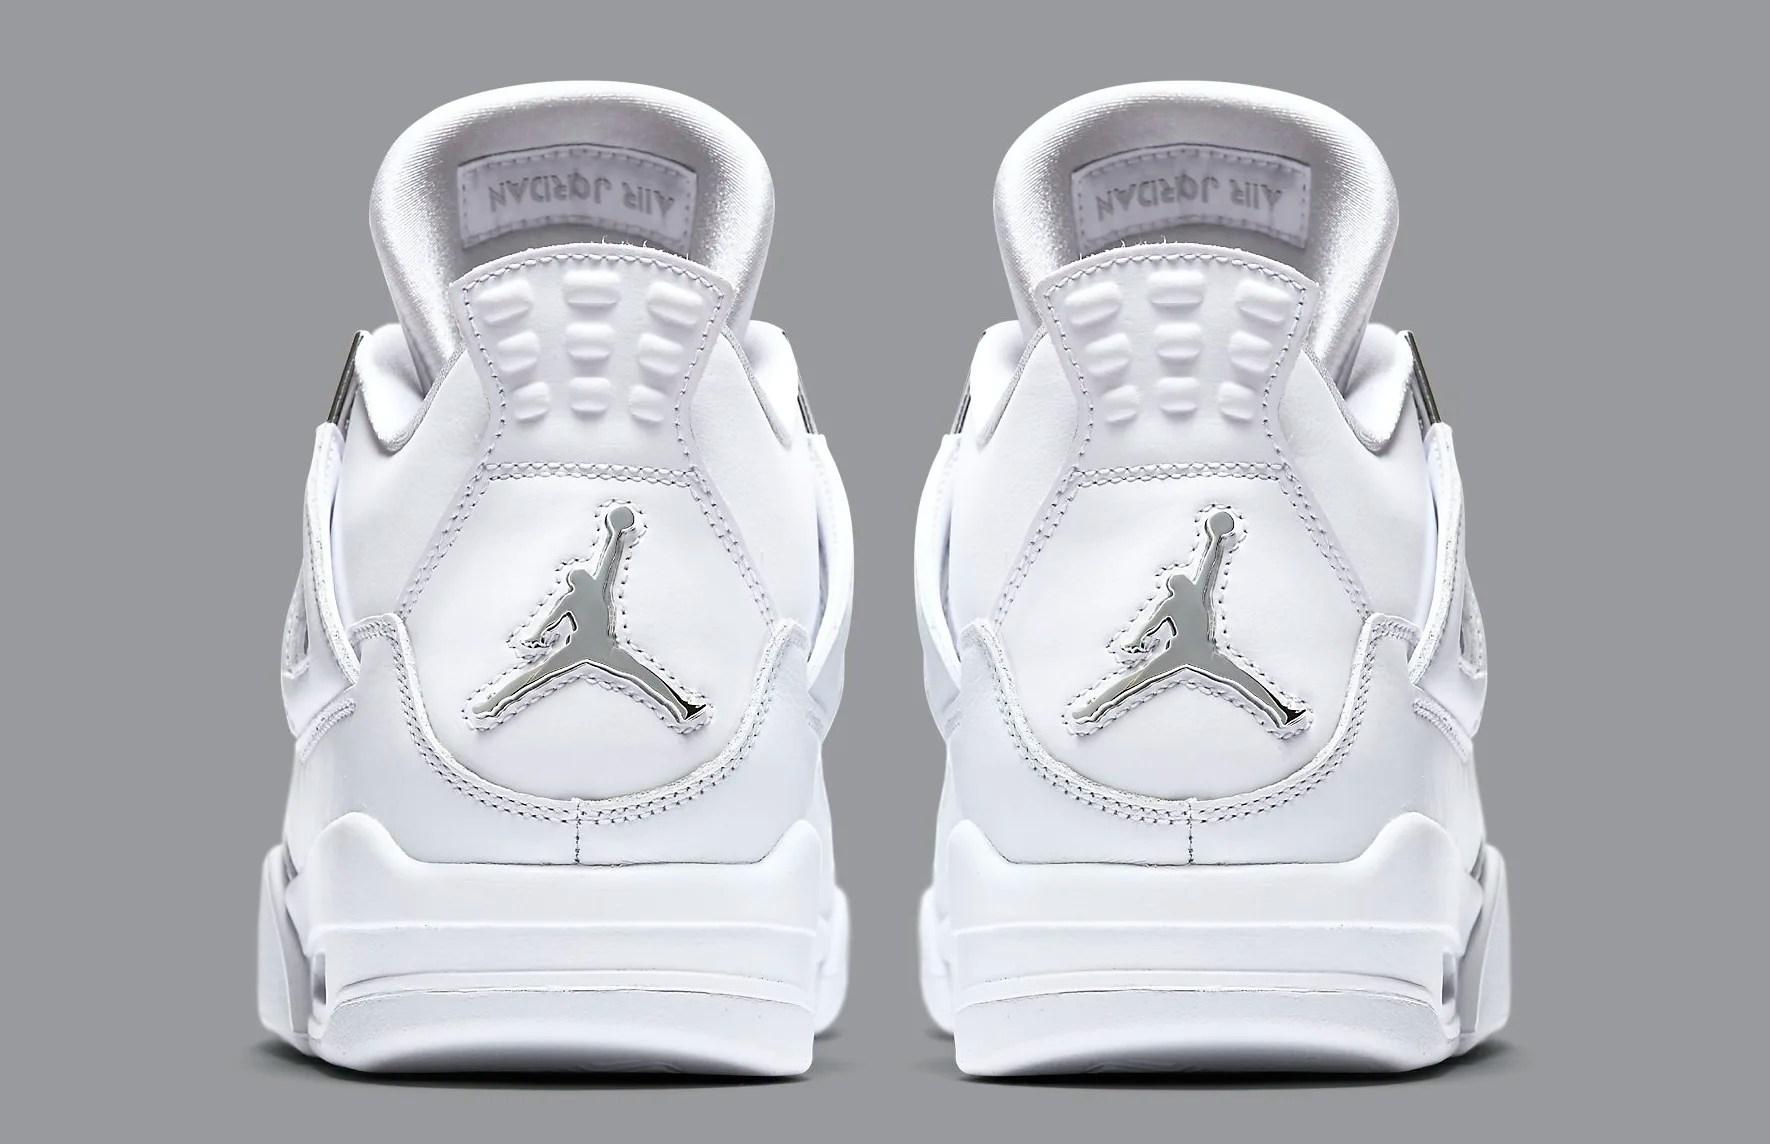 Puro dinero Air Jordan 4 308497-100 talón